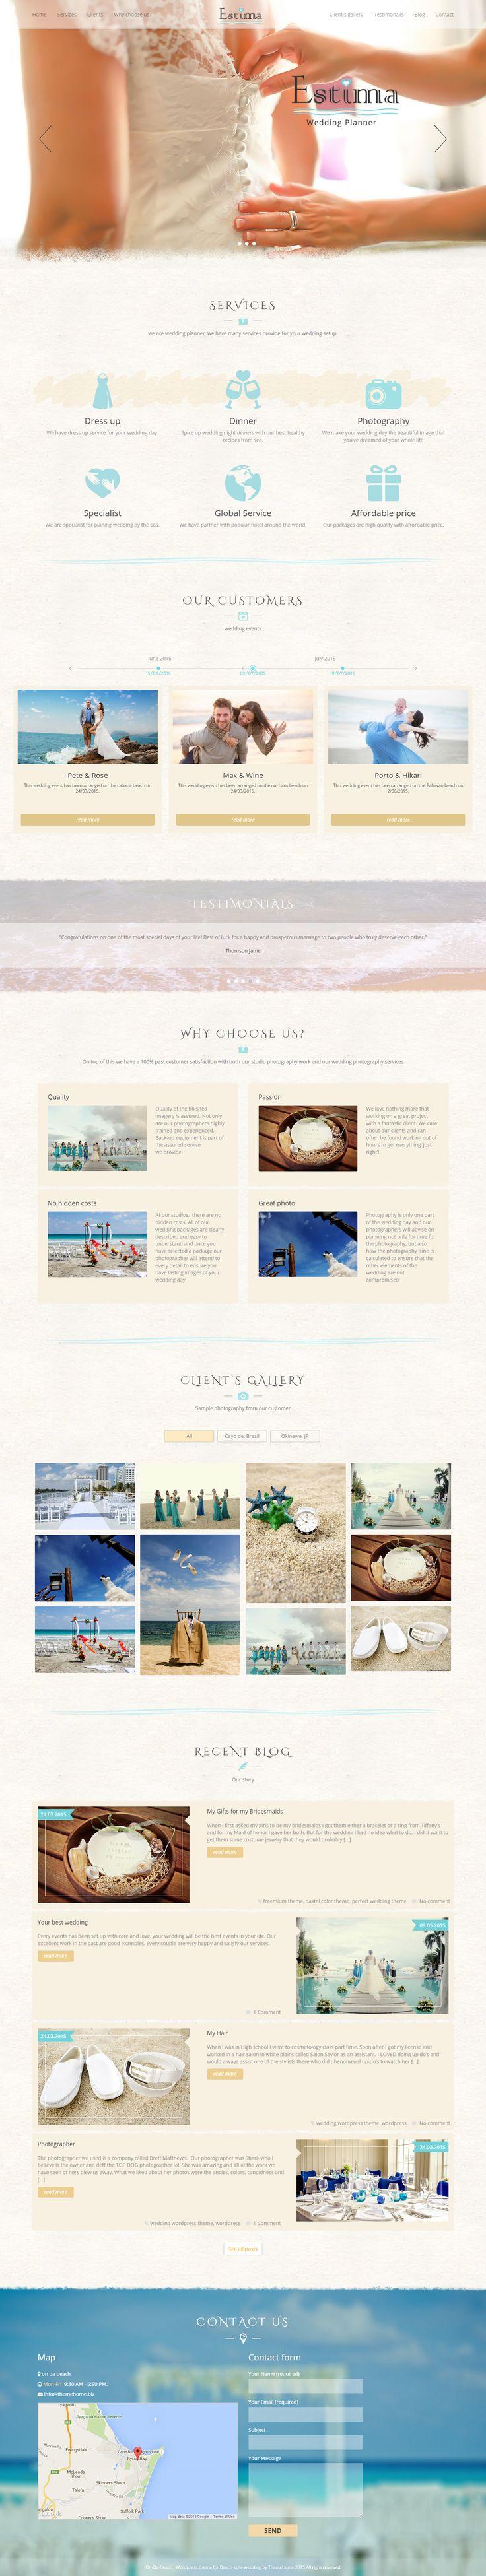 Demo web design for wedding planner